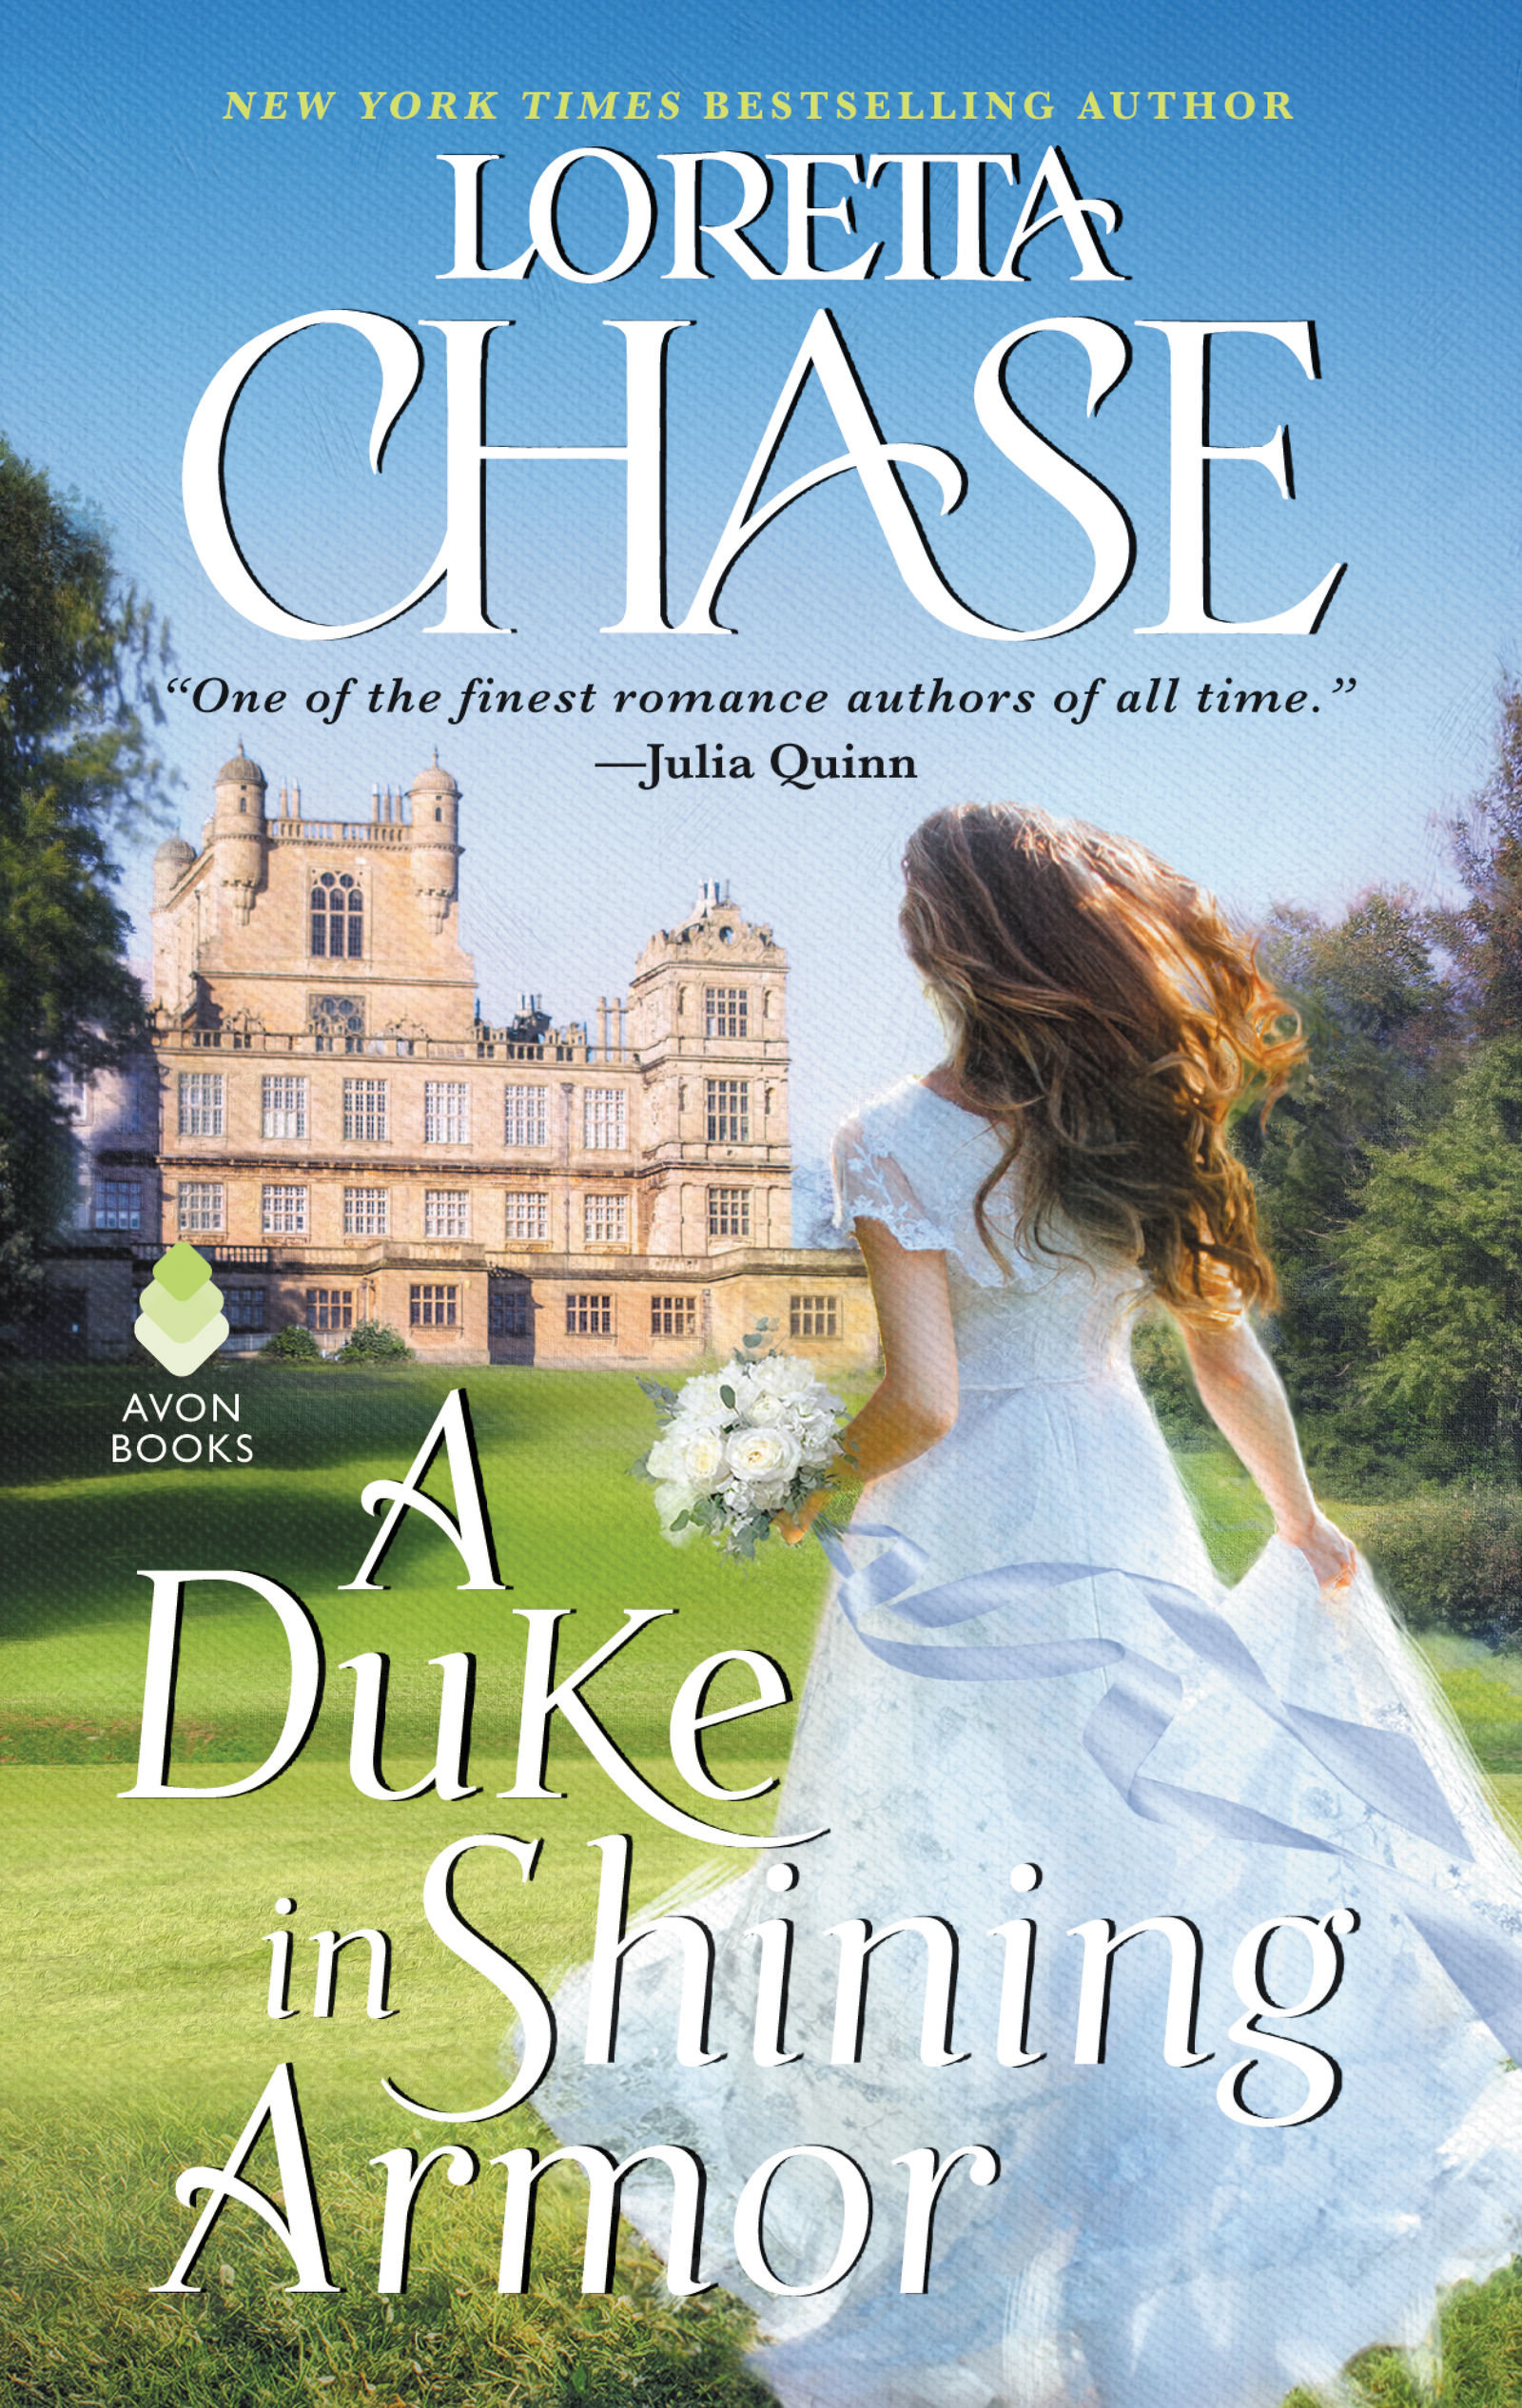 A Duke in Shining Armor cover historical romance